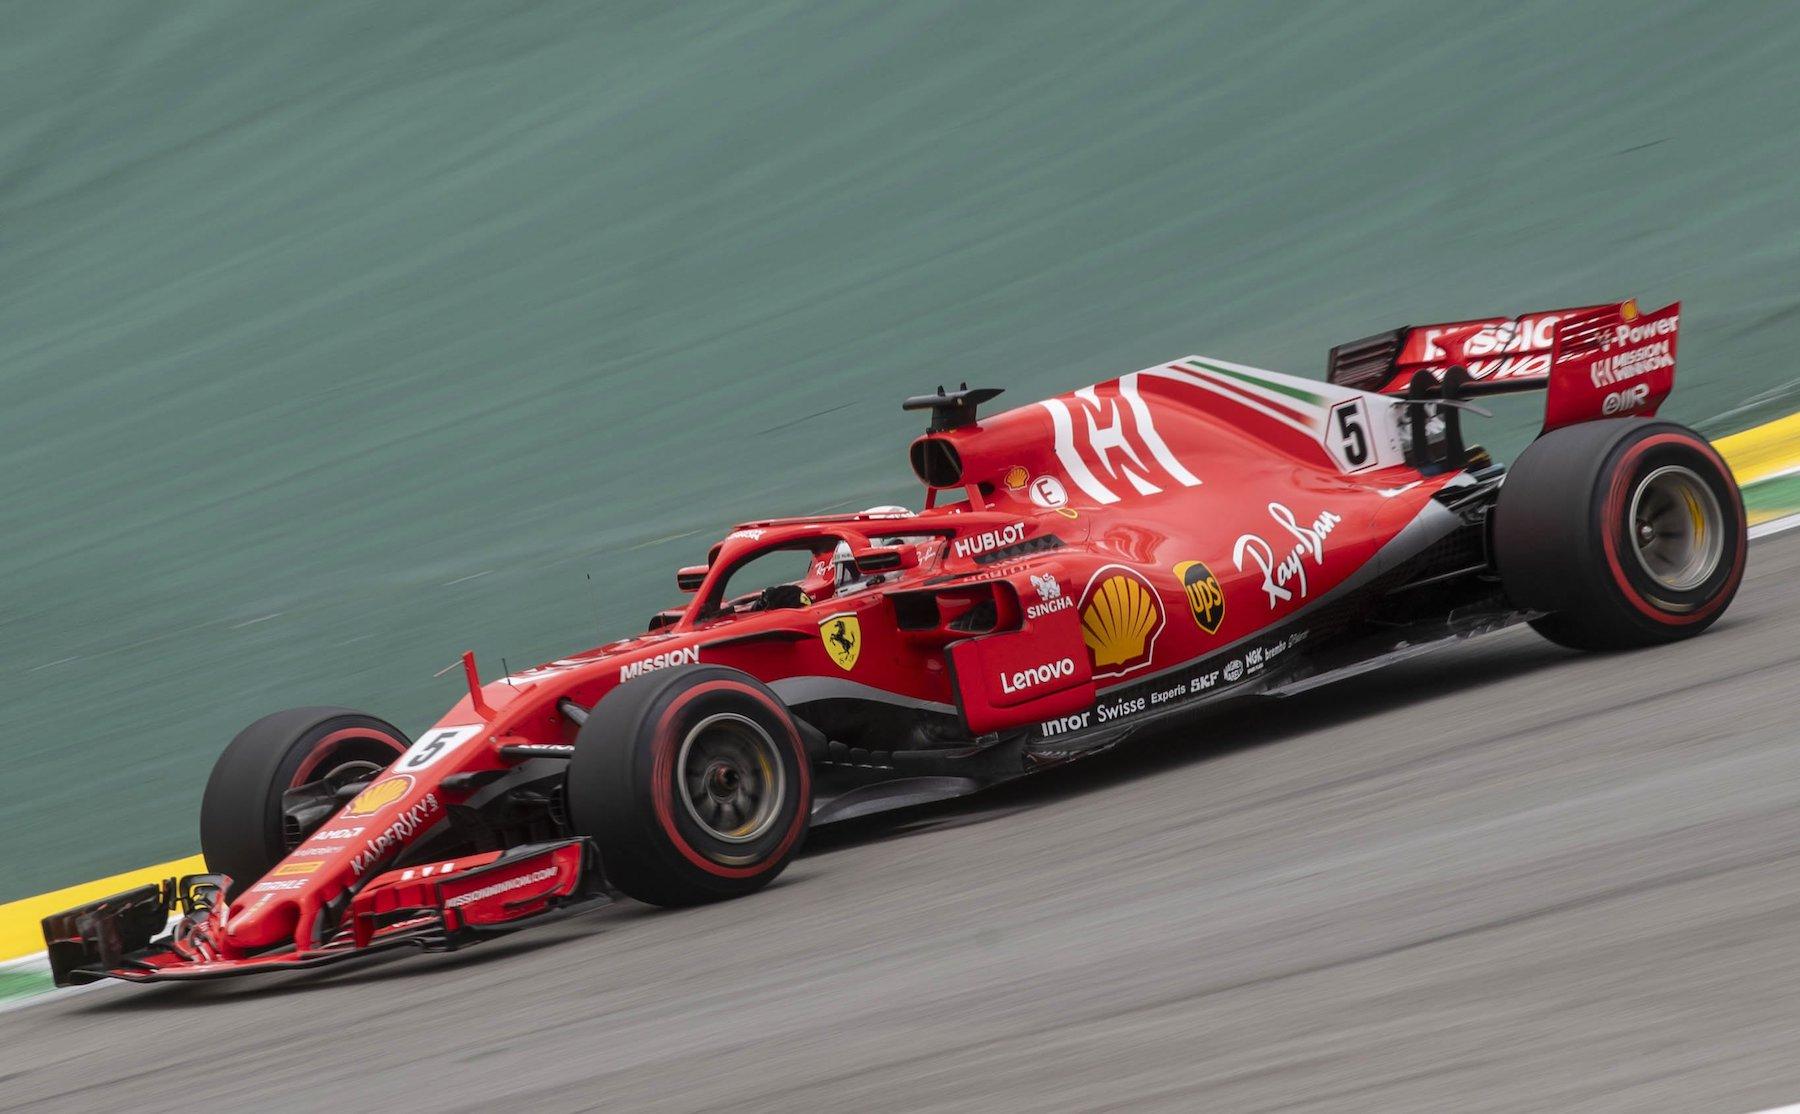 G 2018 Sebastian Vettel | Ferrari SF71H | 2018 Brazilian GP P6 2 copy.jpg